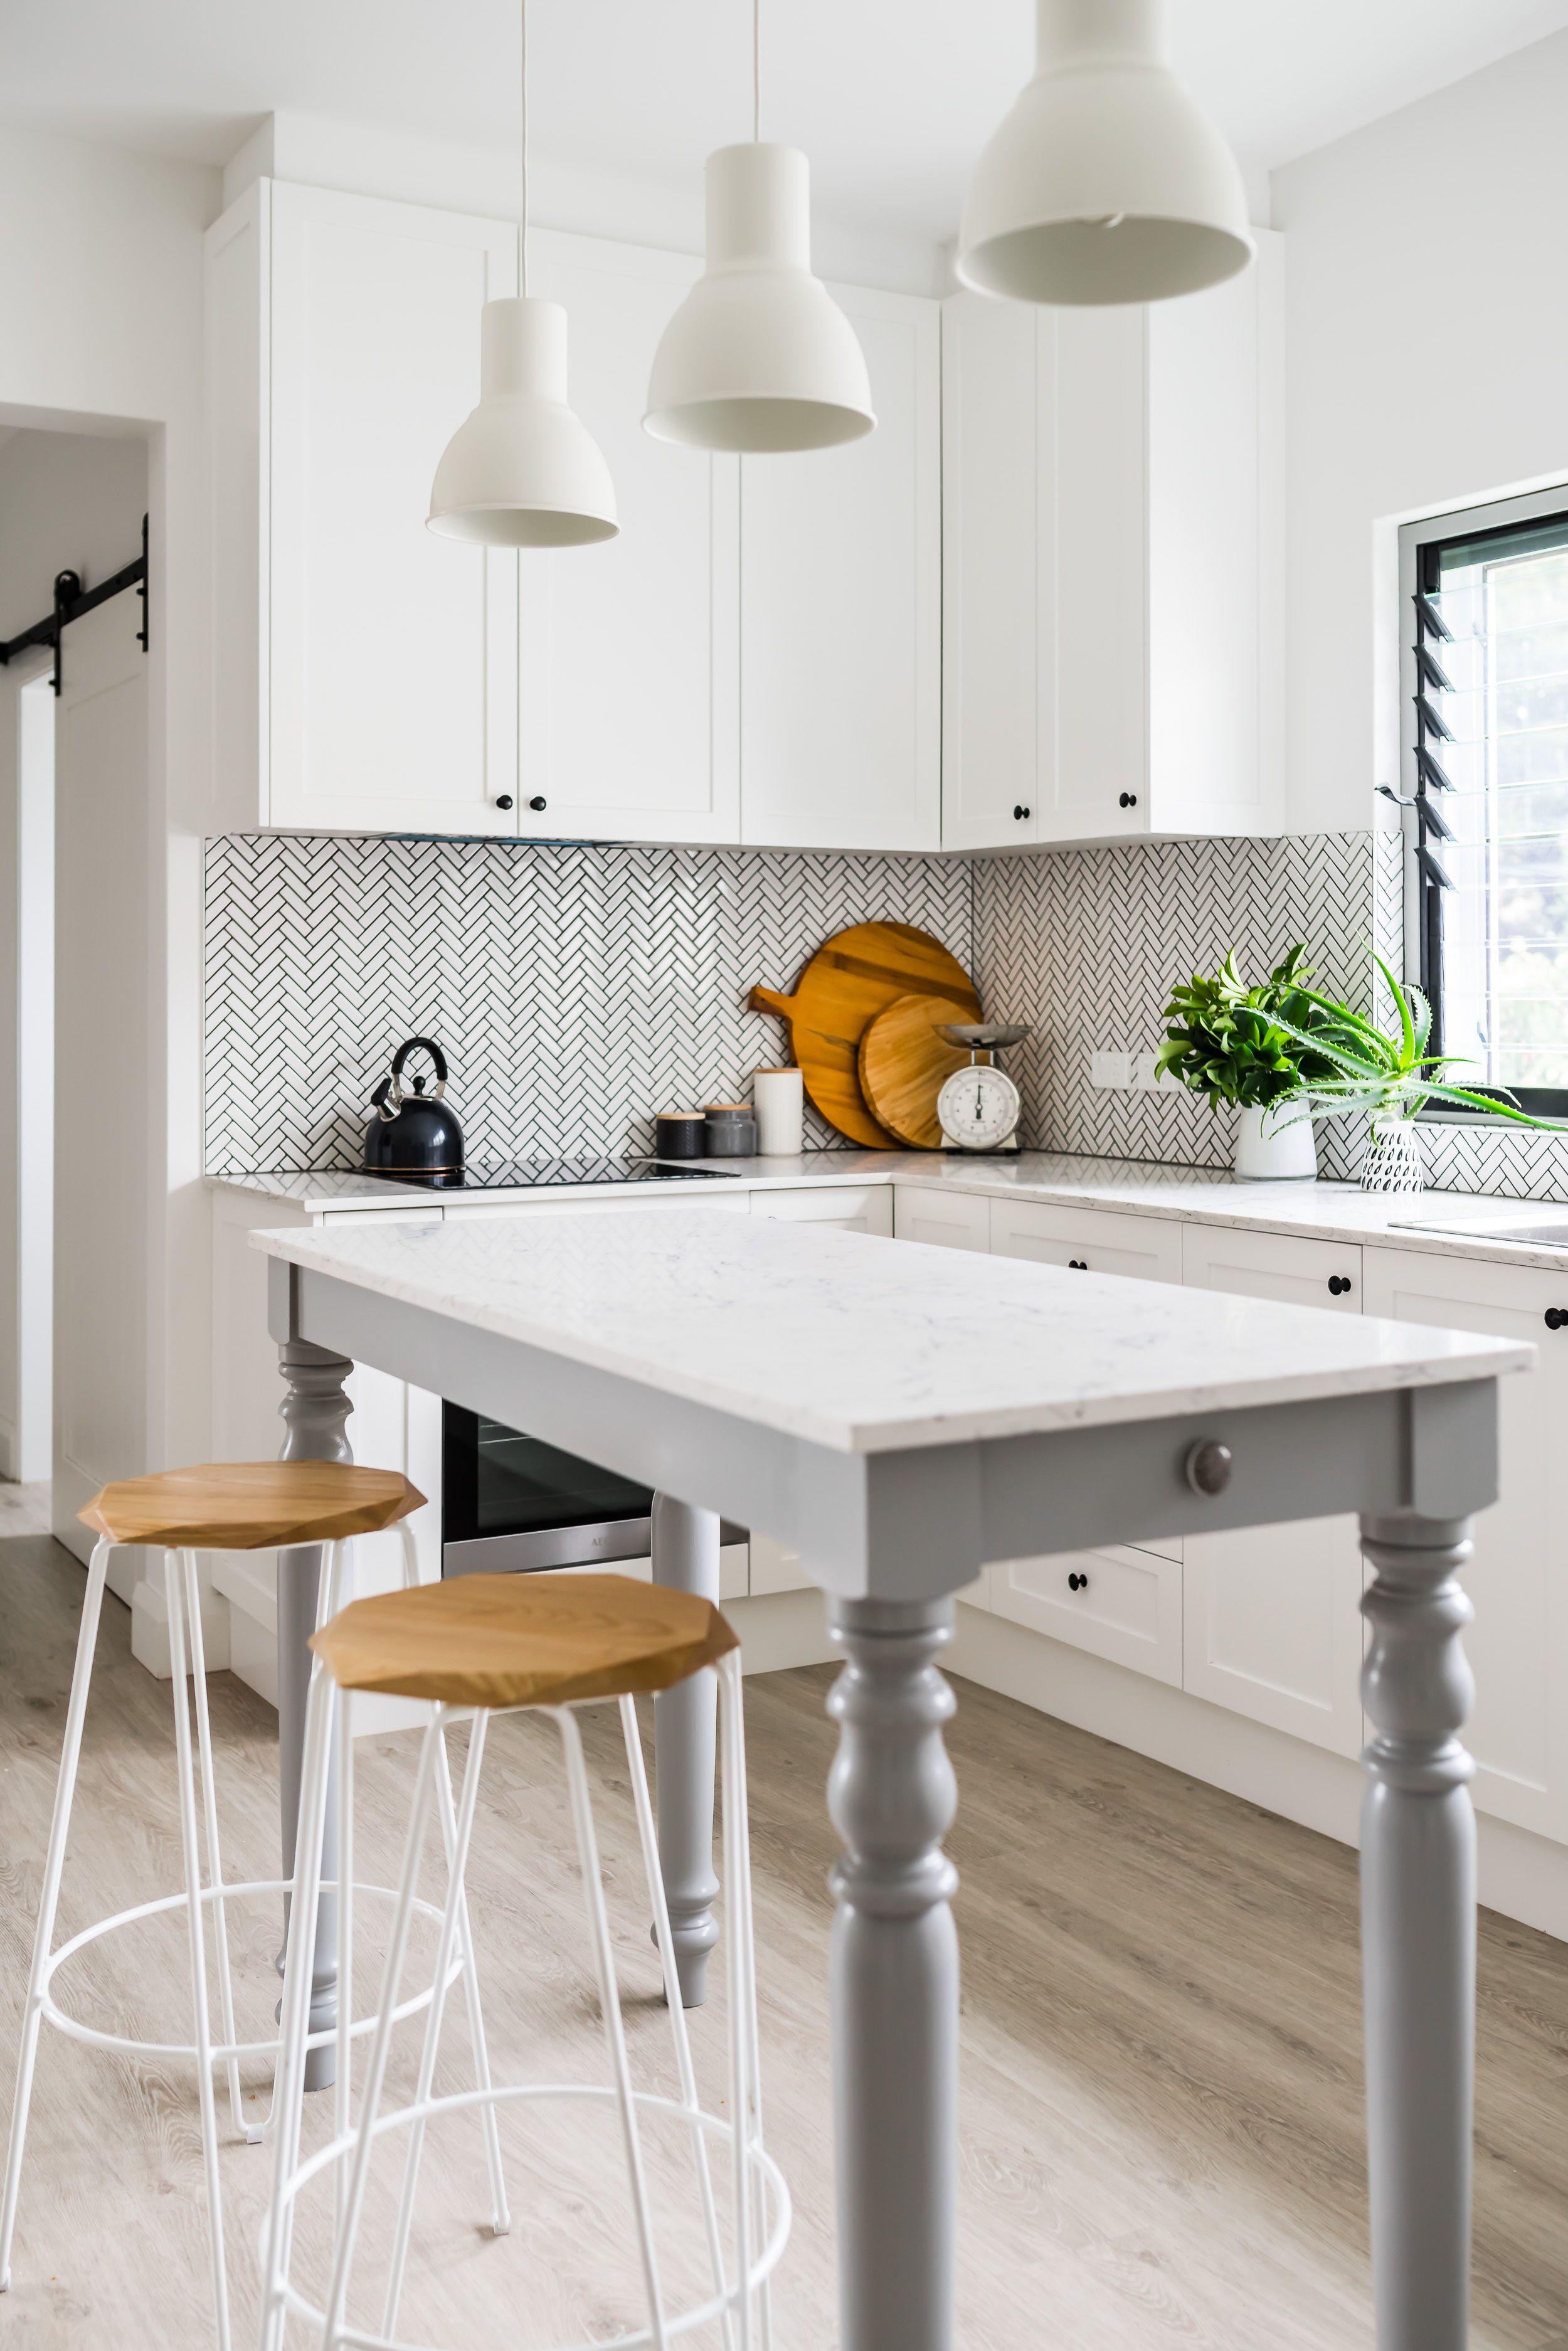 Cottage Style Kitchen 'Furniture' like Kitchen Island ...